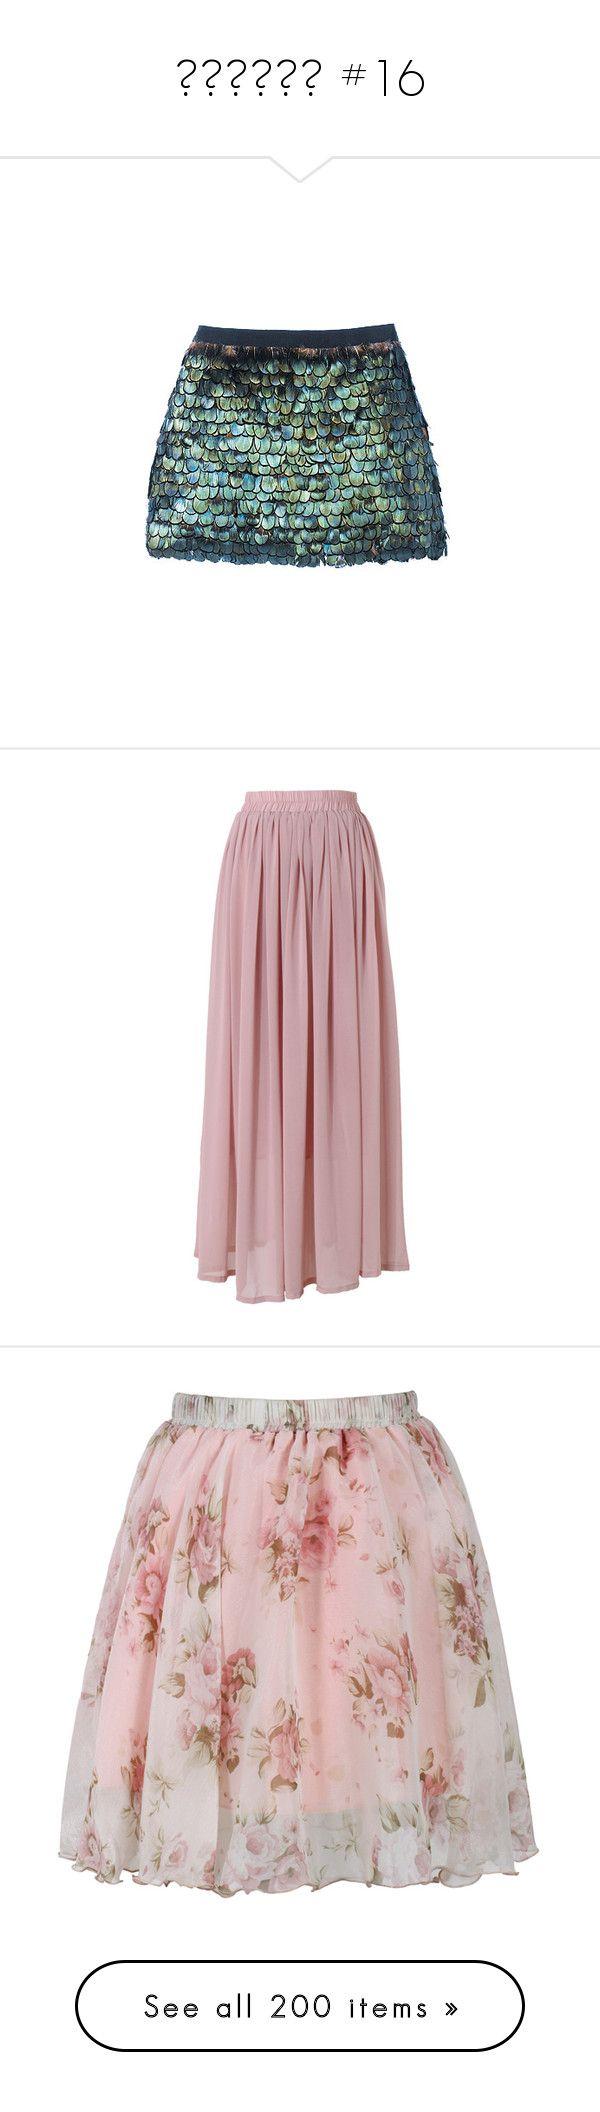 """ṡҡıяṭṡ #16"" by booknerd1326 ❤ liked on Polyvore featuring skirts, bottoms, saias, faldas, maxi skirts, pink, chiffon skirts, long pink skirt, long pleated skirt and pink chiffon skirt"